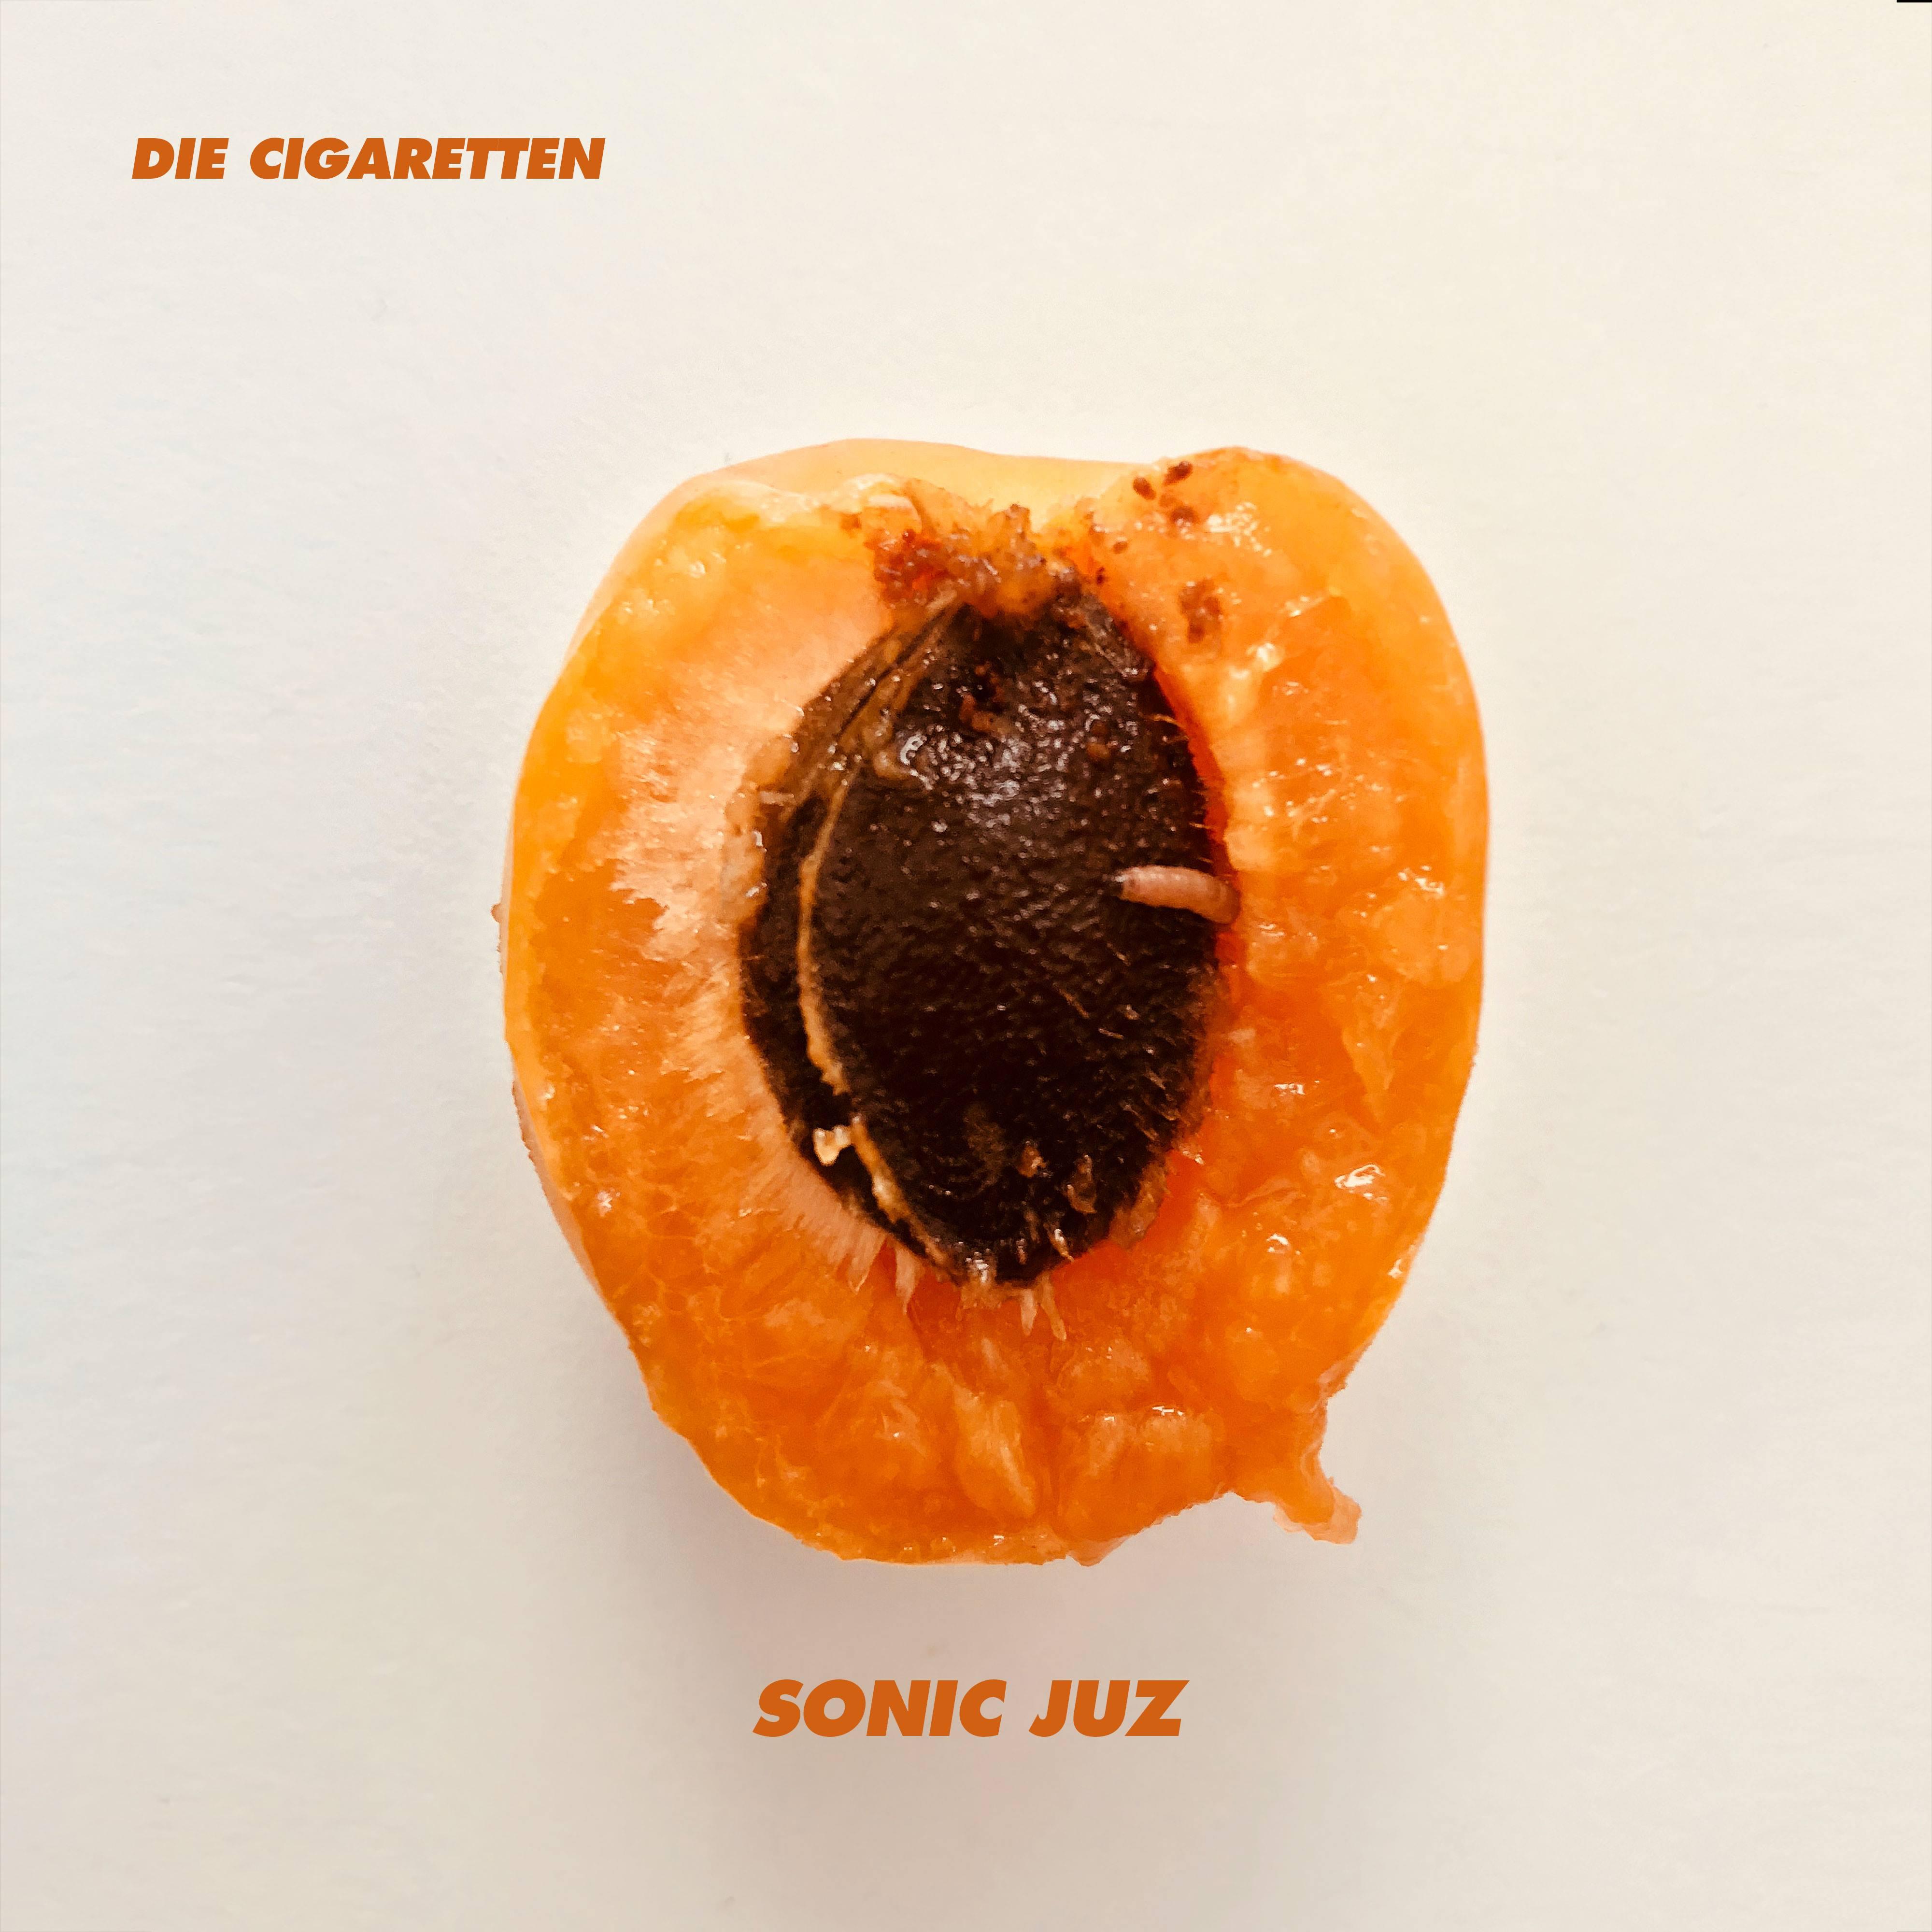 Die Cigaretten - Sonic Juz EP